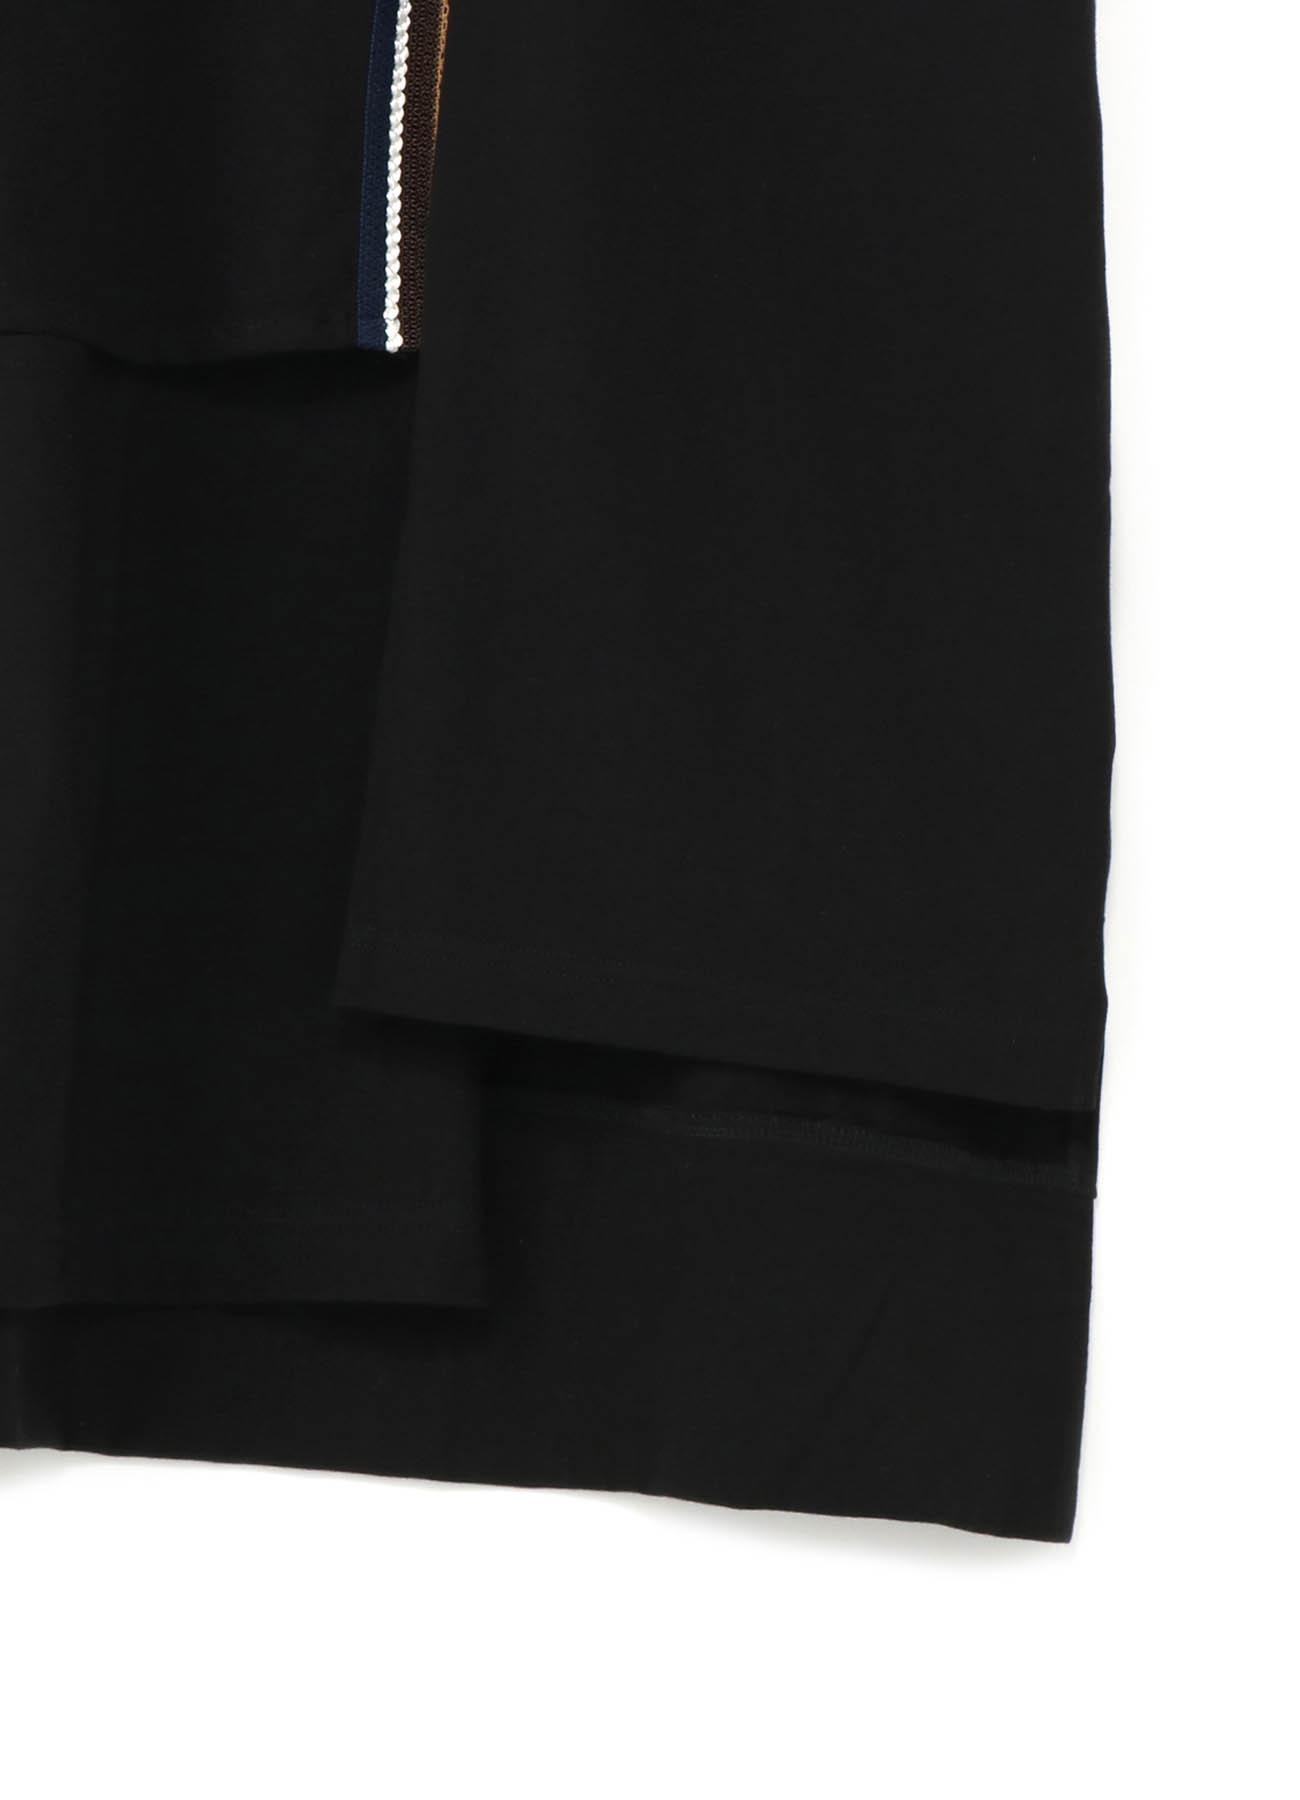 30/cotton Jersey Original tape Snap slit Short Cut Sew